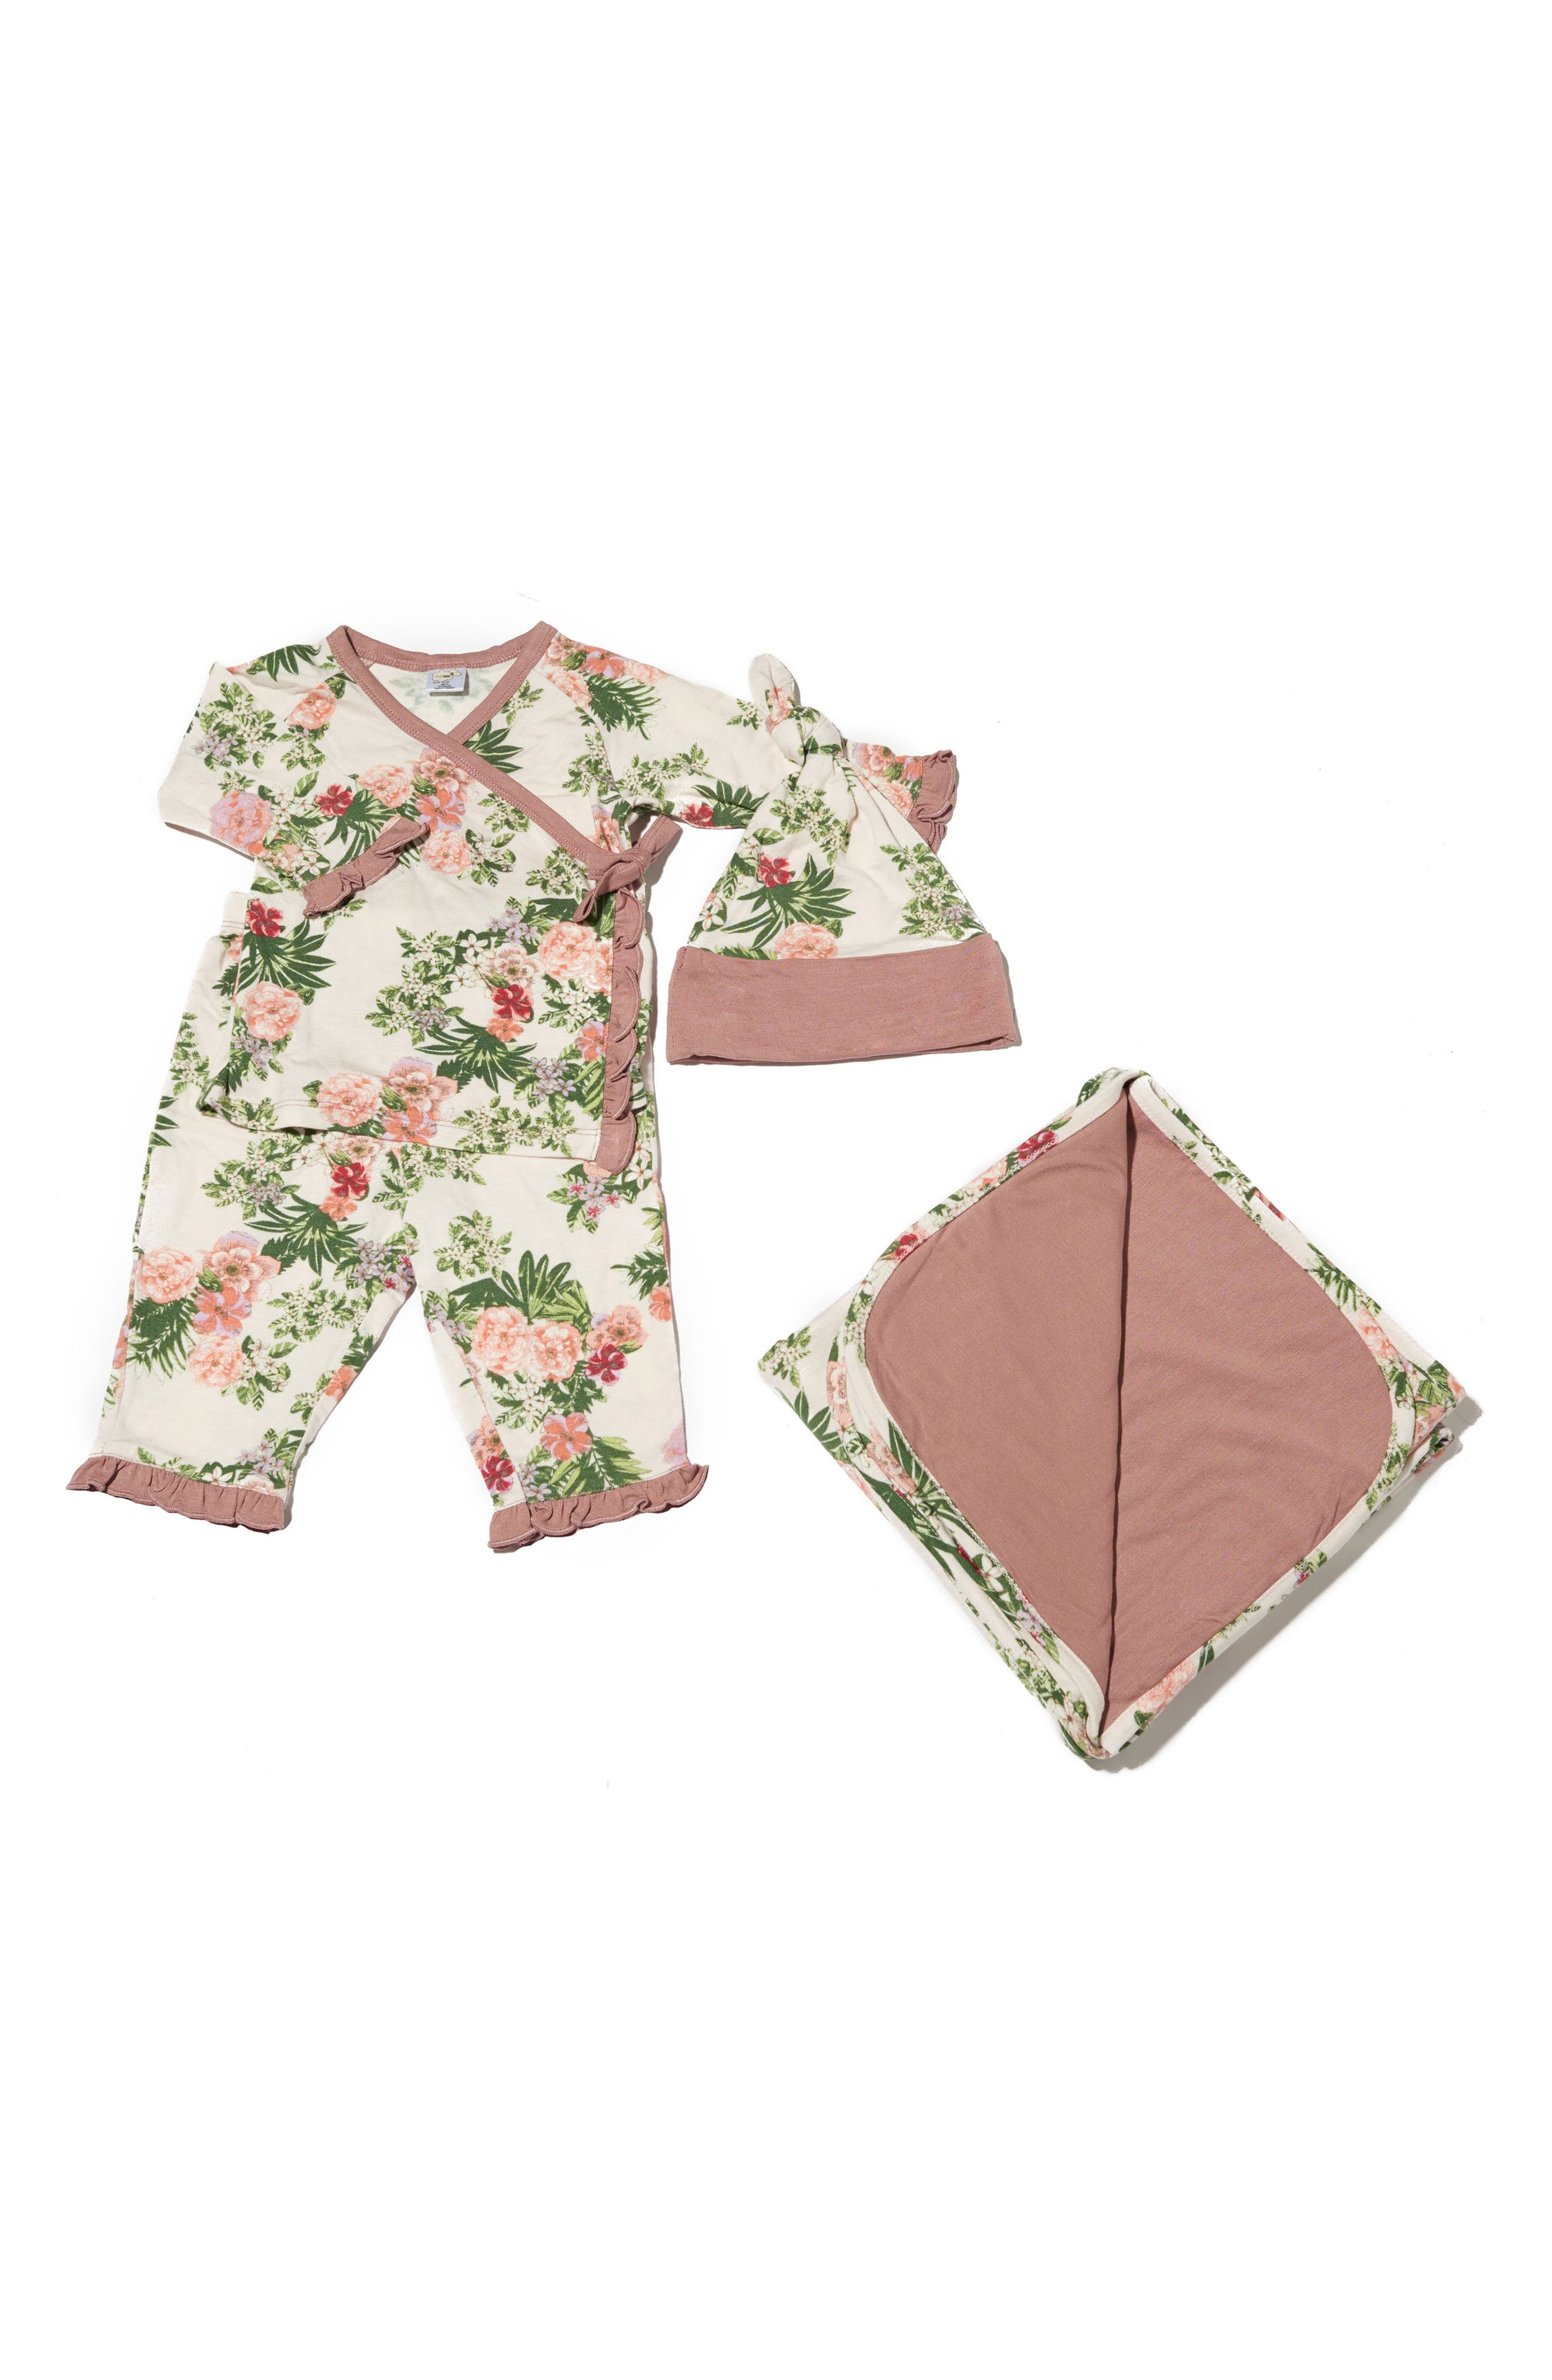 Ruffle Kimono Top, Pants, Hat & Blanket Set,                             Main thumbnail 1, color,                             BEIGE FLORAL